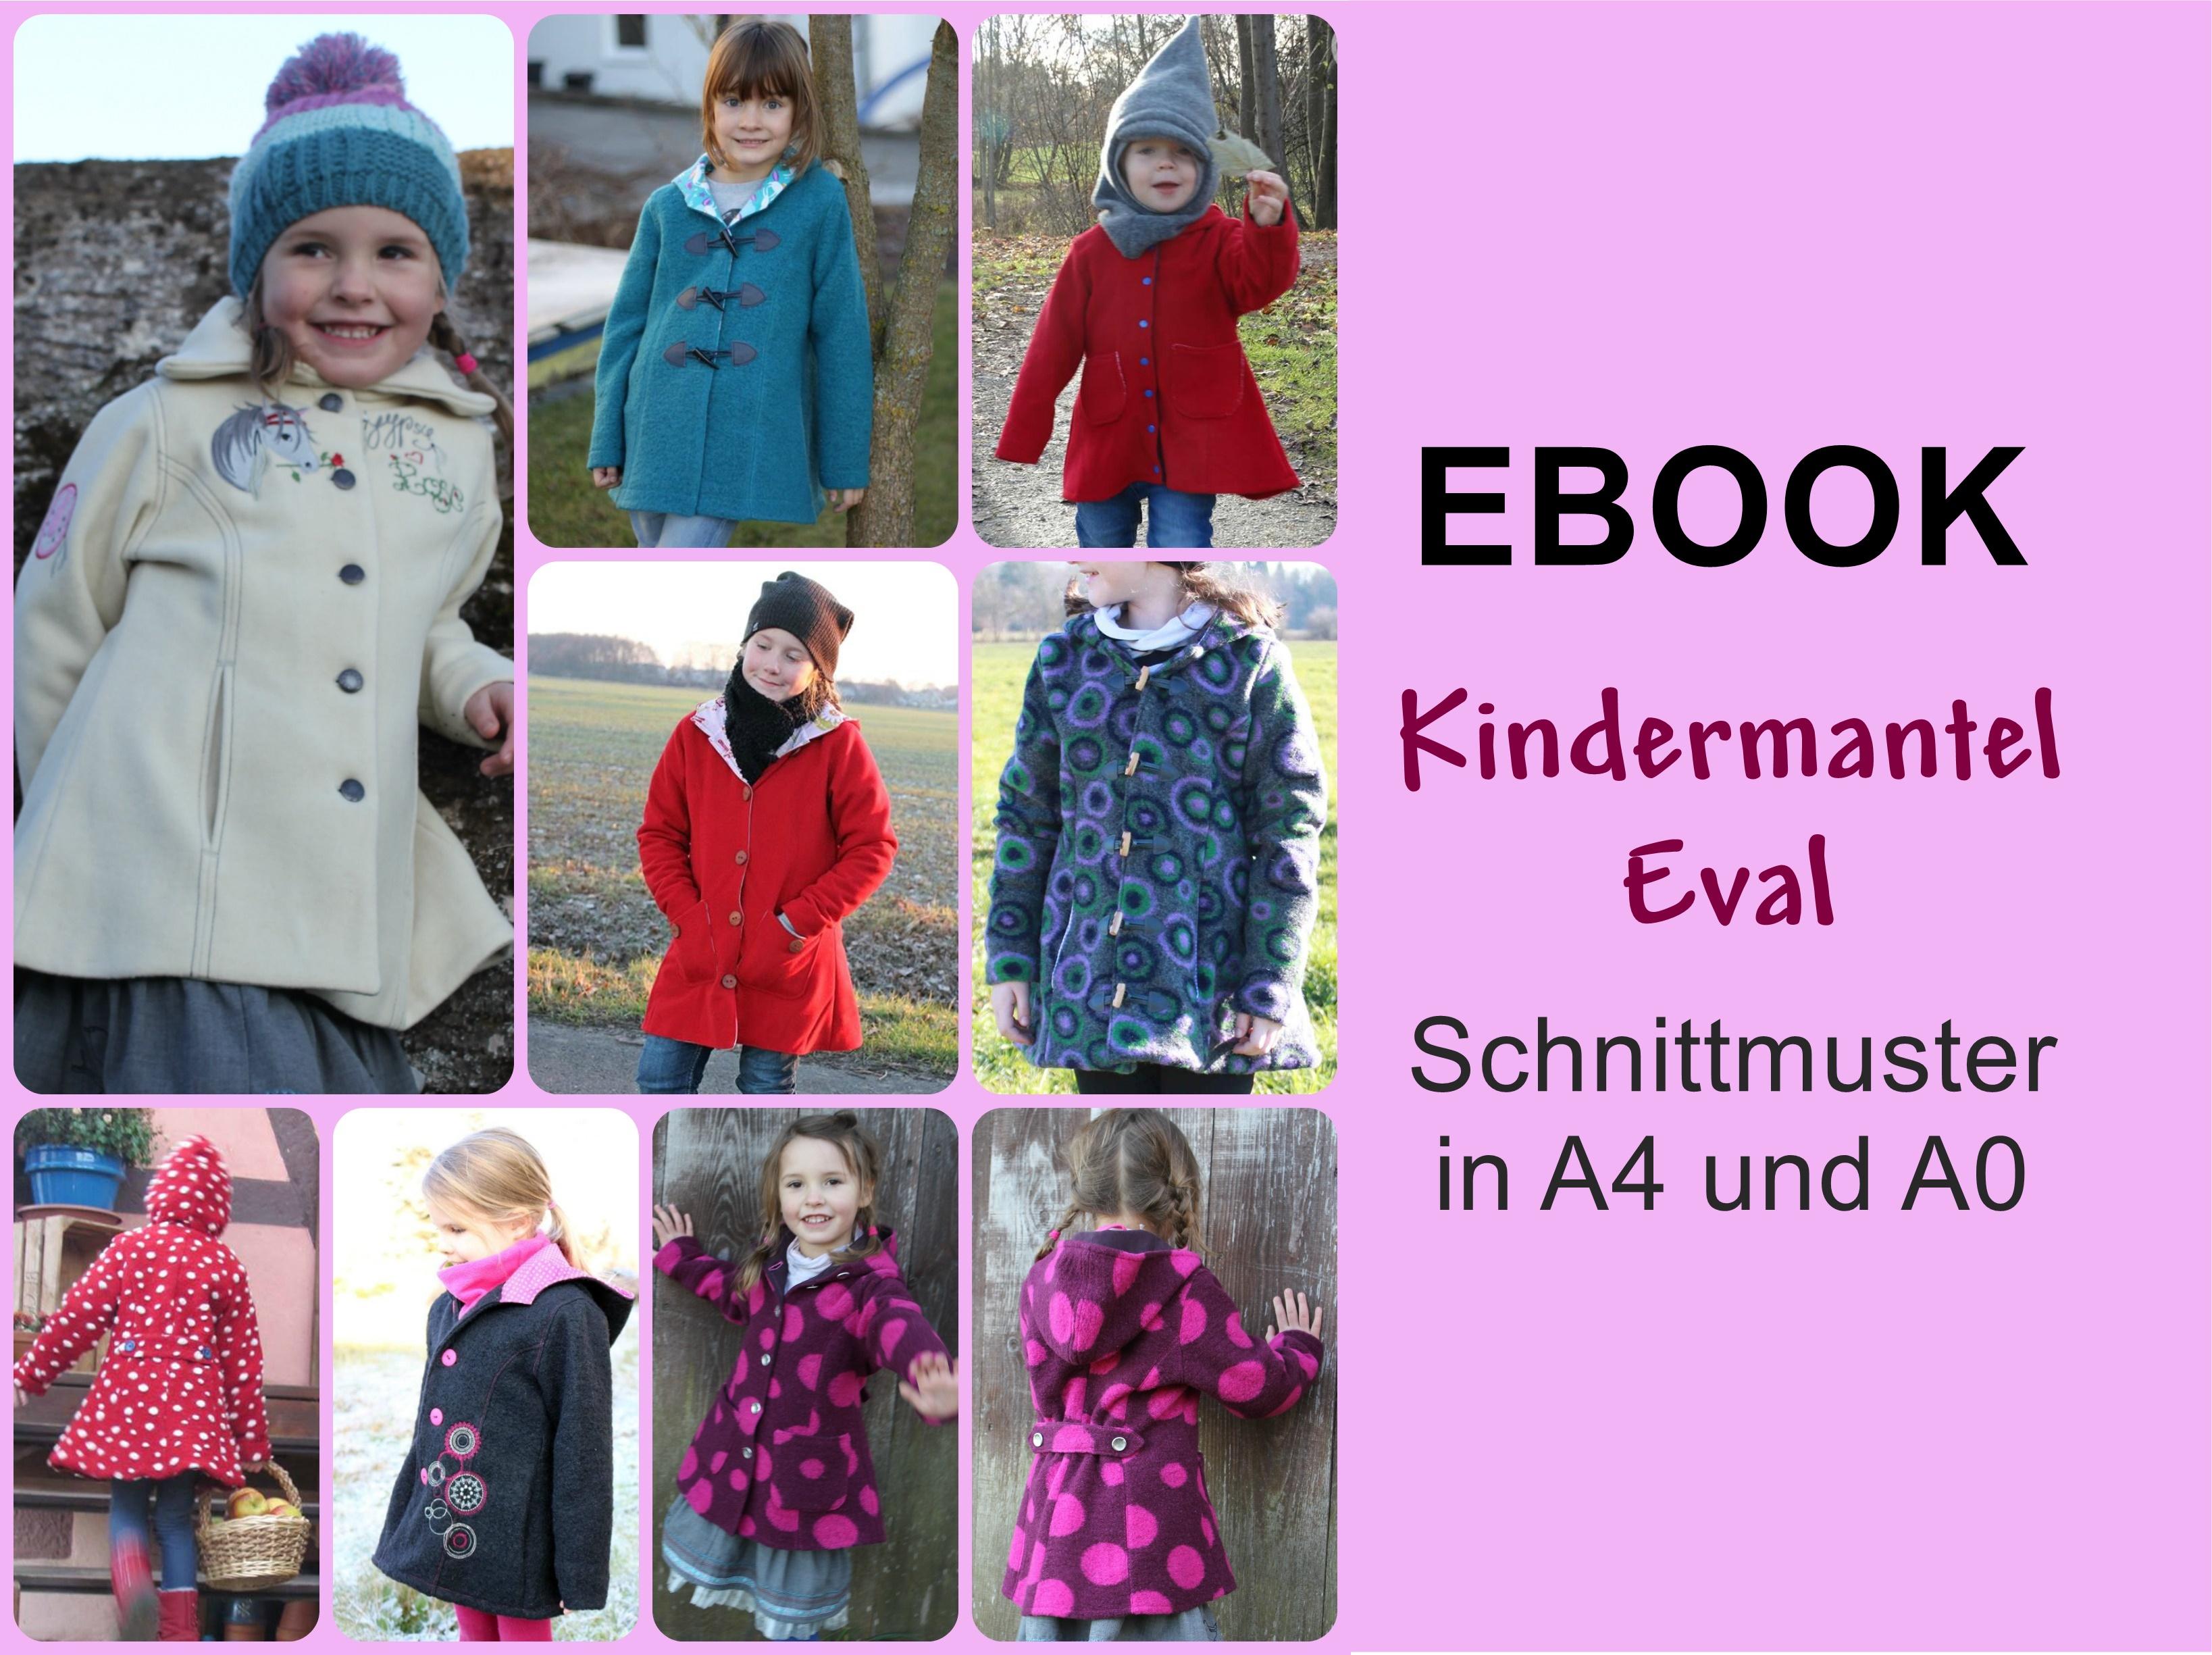 Kindermantel Eval Mantel Ebook Schnittmuster mit Anleitung